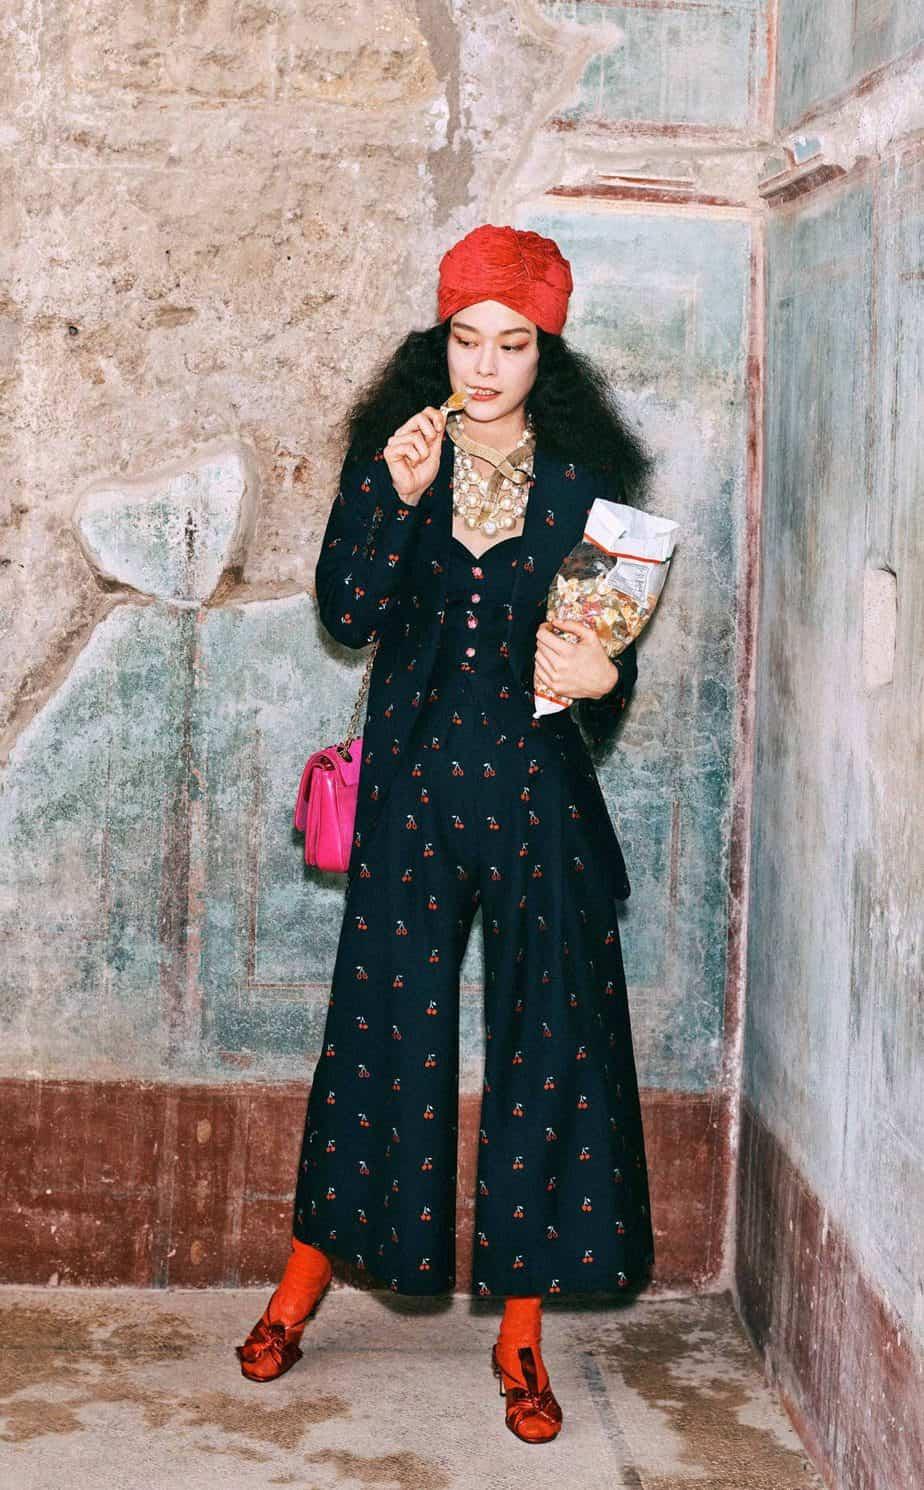 GUCCI, FALL 2019. WOMEN'S FASHION, Photographer Harmony Korine, Art Director, Christopher Simmonds - 4